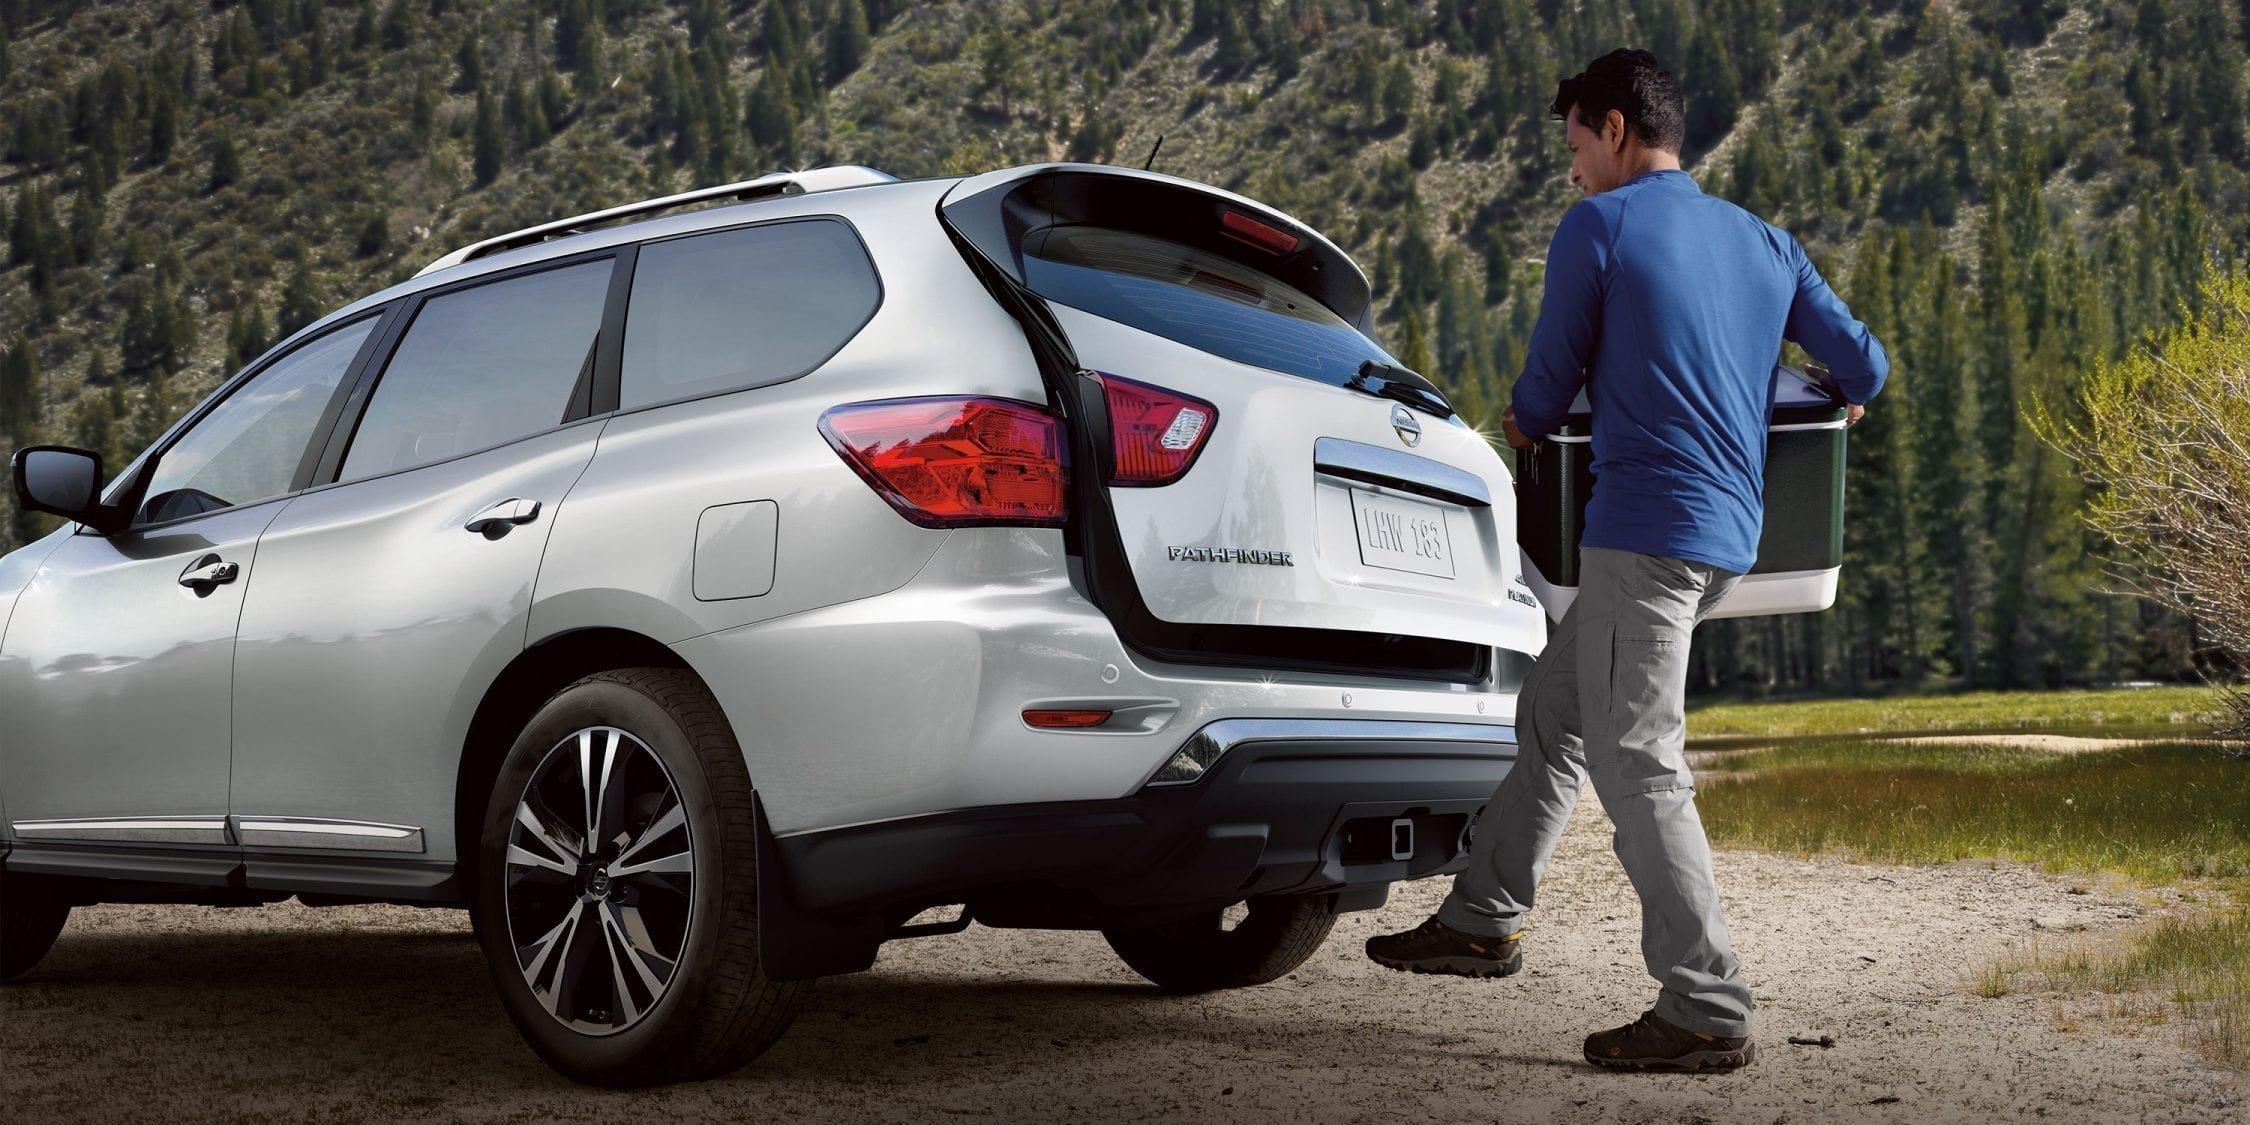 2019 Nissan Pathfinder Review New Nissan Dealer Near Me